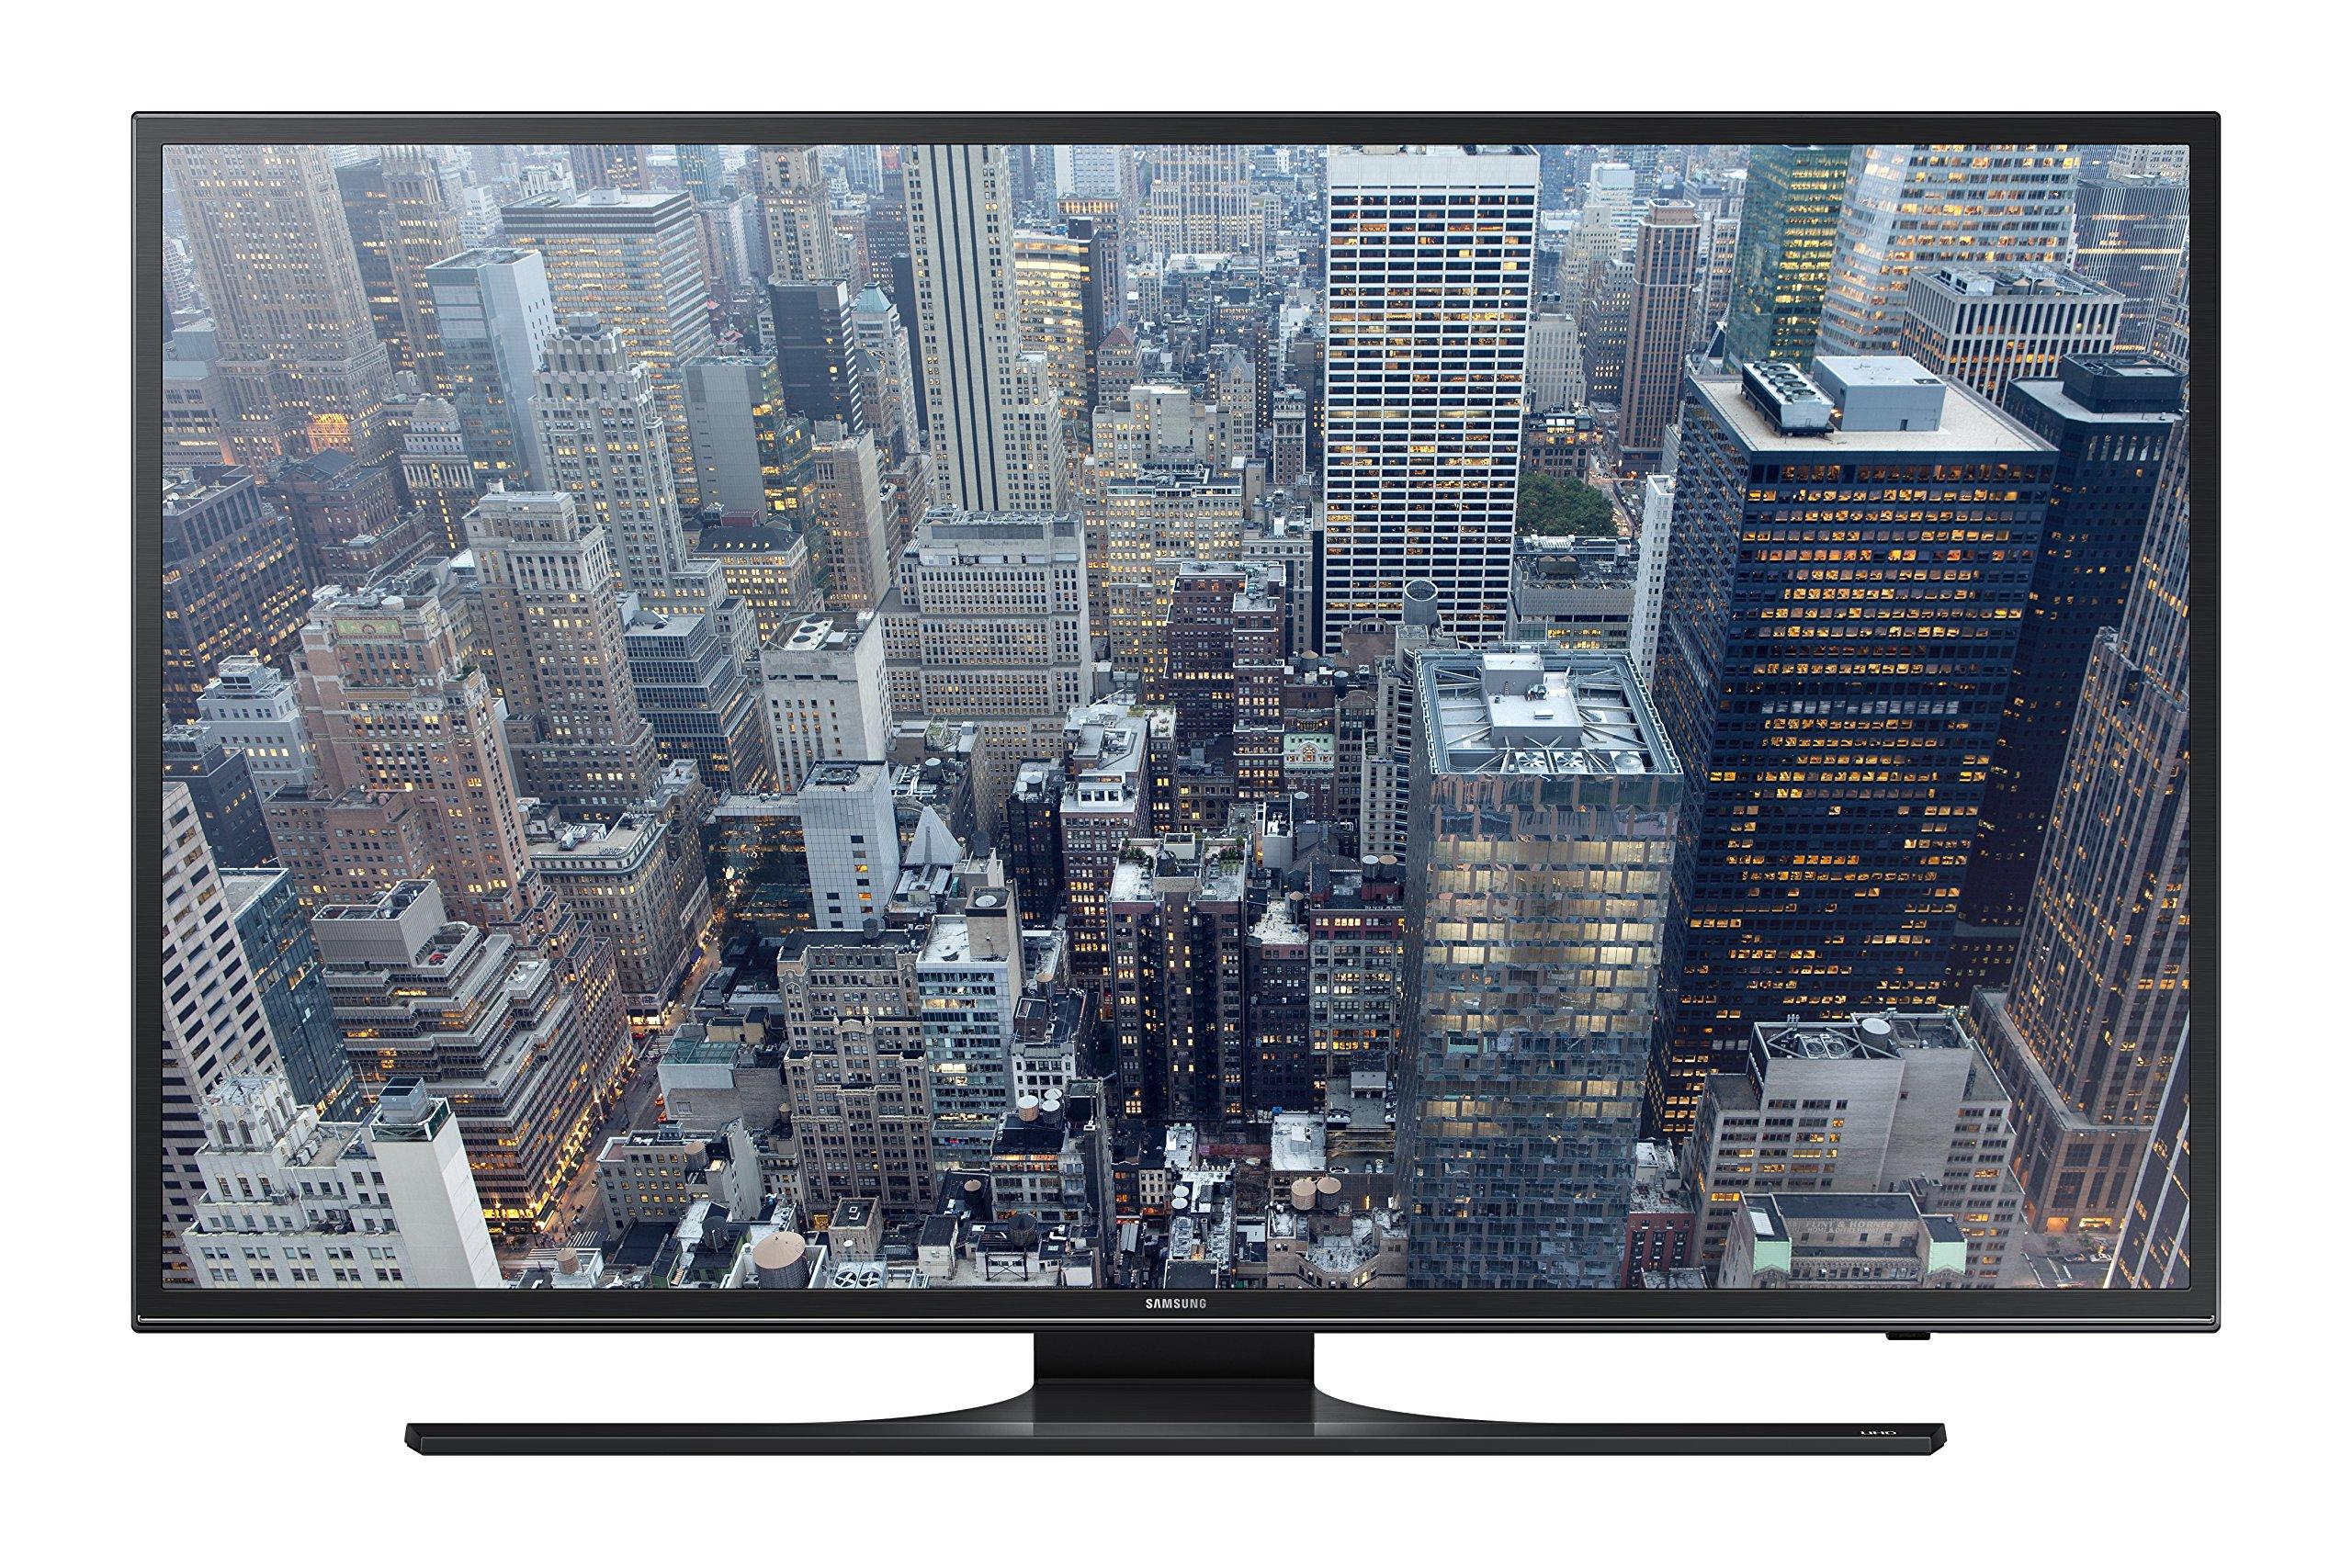 Samsung UN65JU6500 65-Inch 4K Ultra HD Smart LED TV (2015 Model)